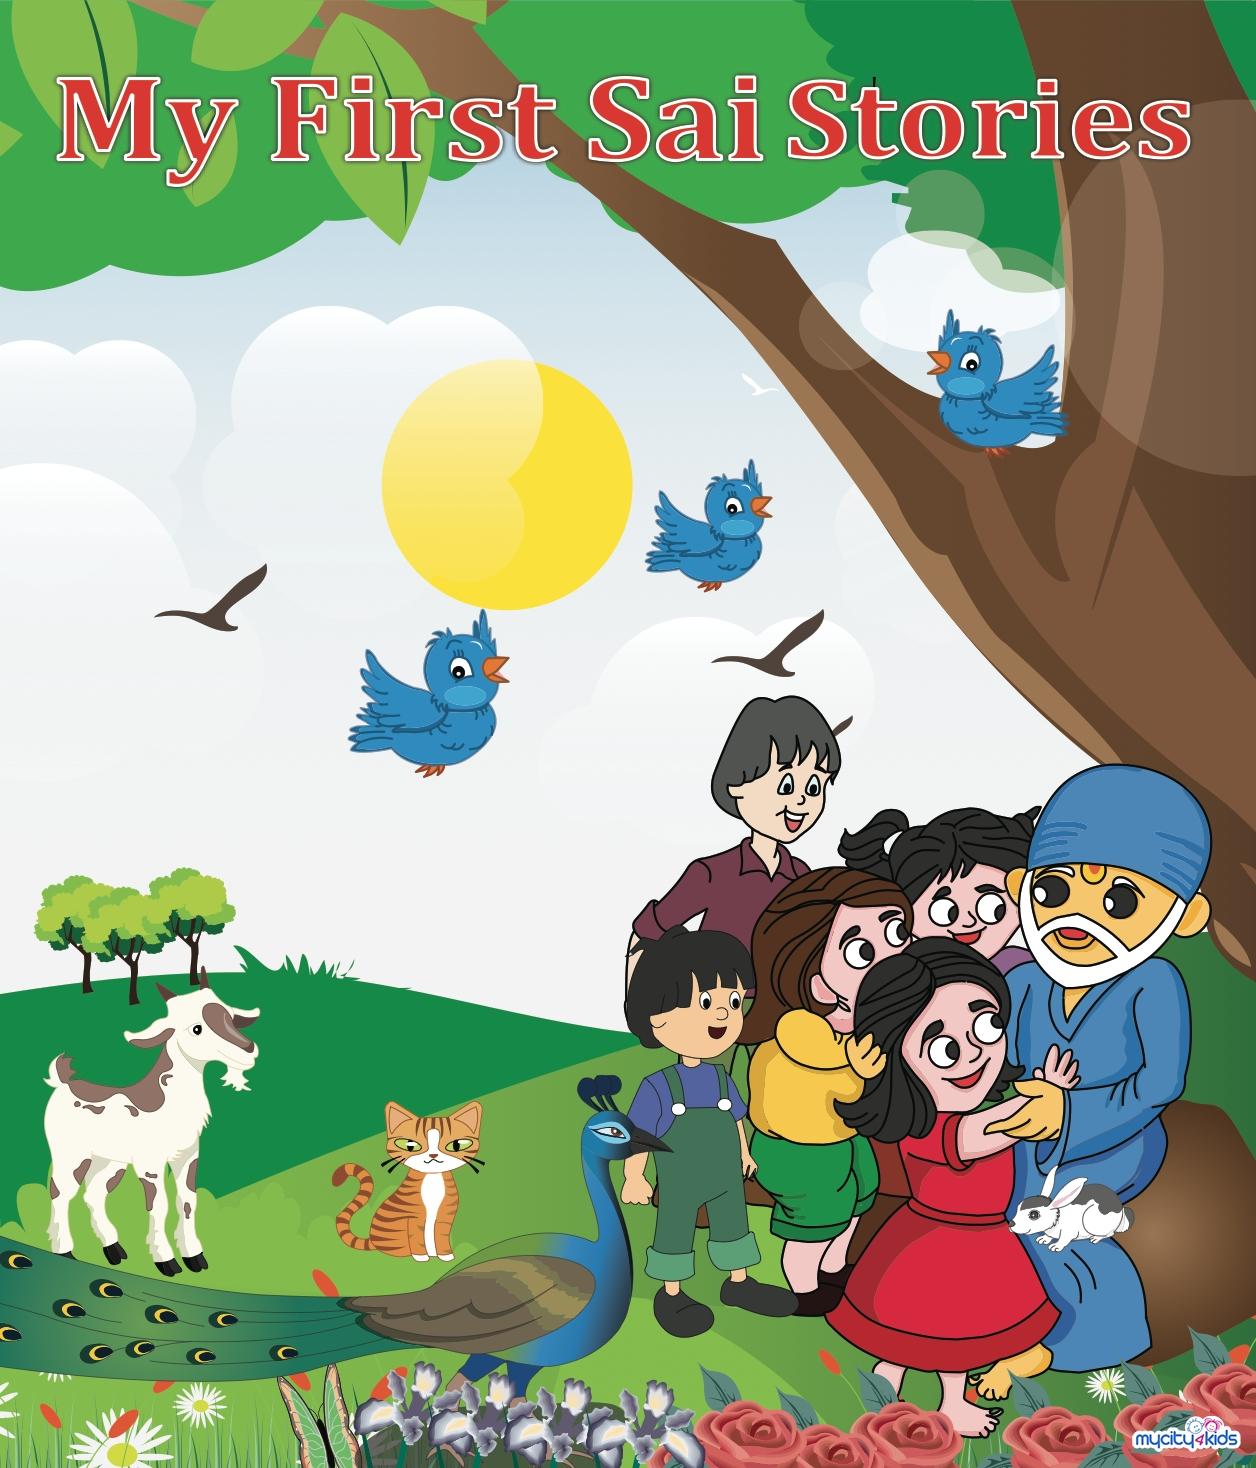 My First Sai Stories